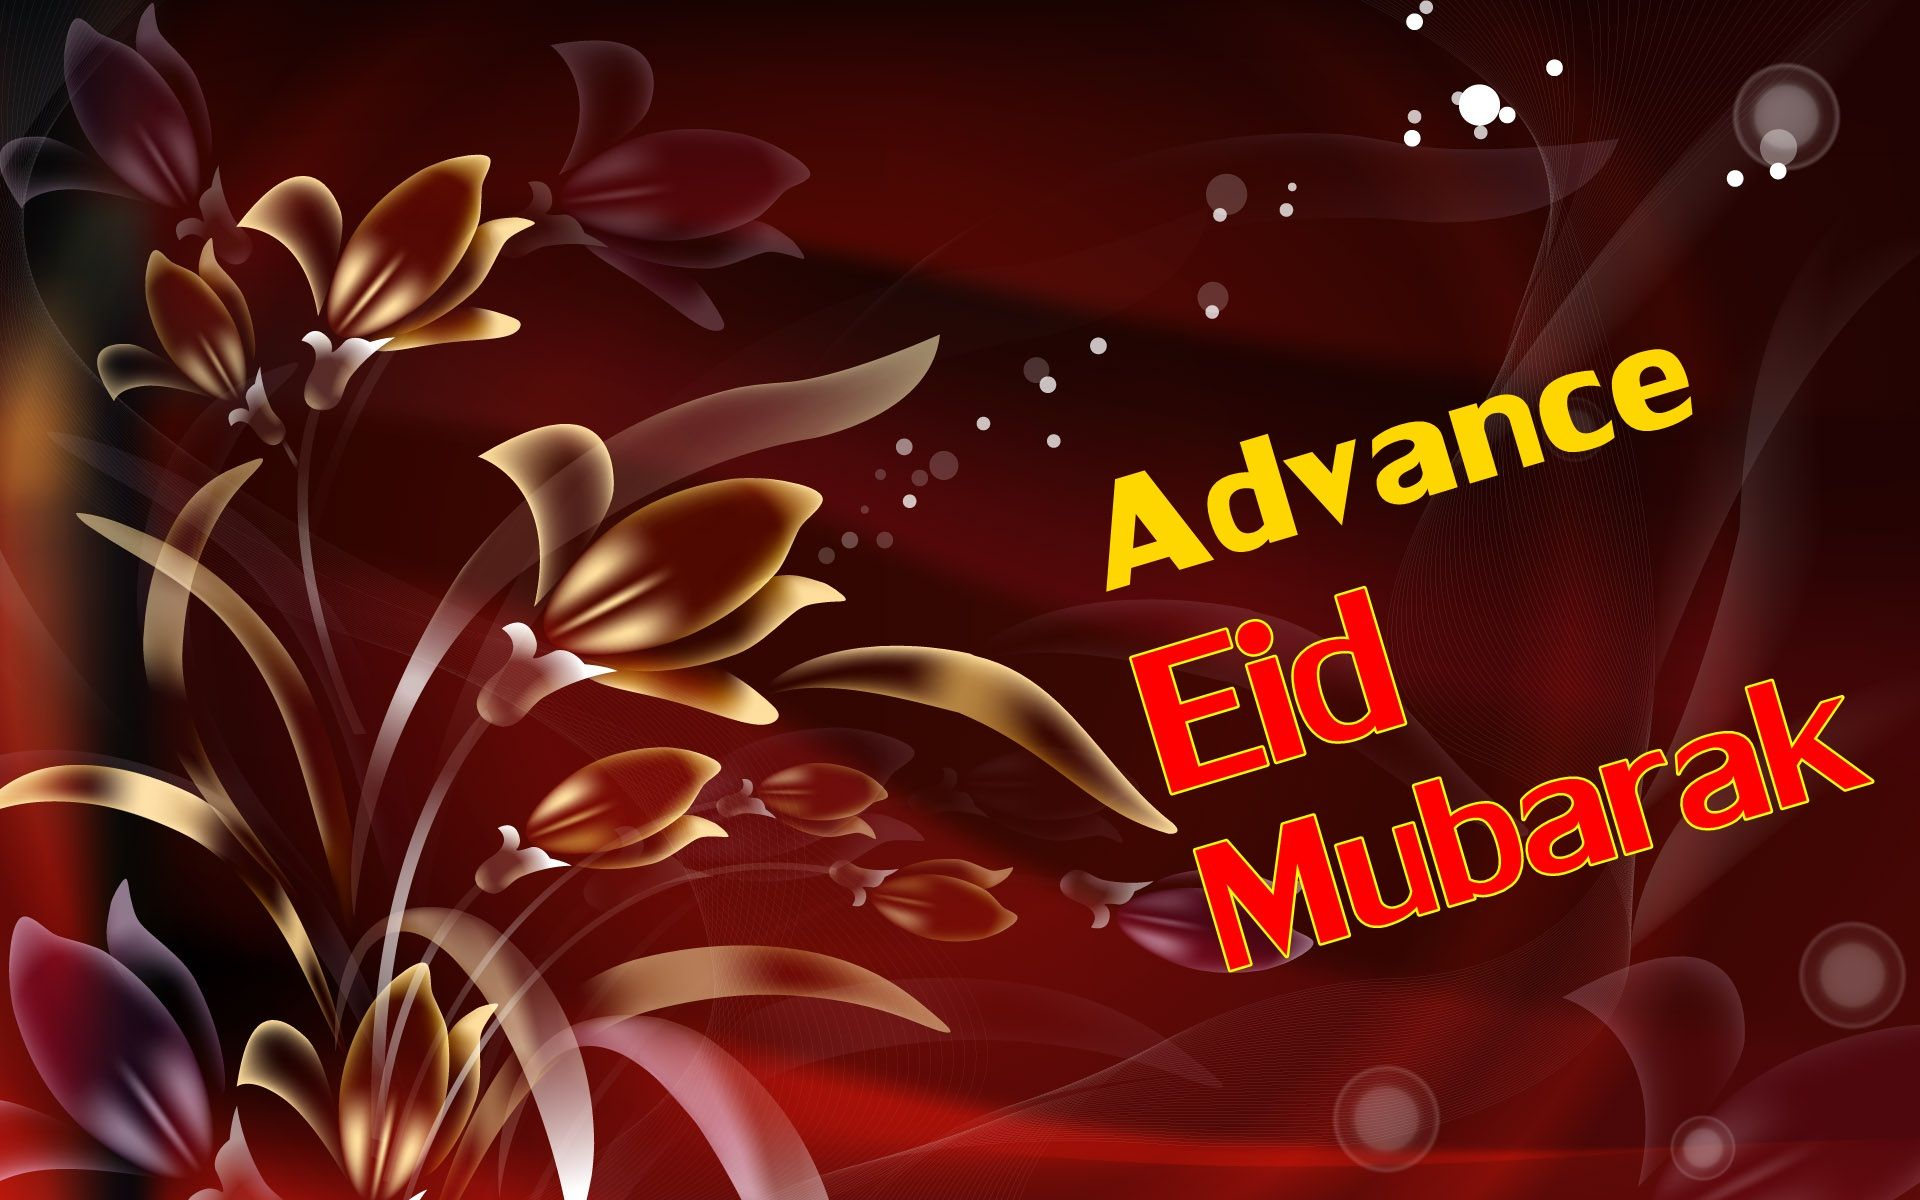 Advance eid mubarak images eid mubarak pinterest eid mubarak advance eid chand raat mubarak wishes messages in english hindi kristyandbryce Choice Image